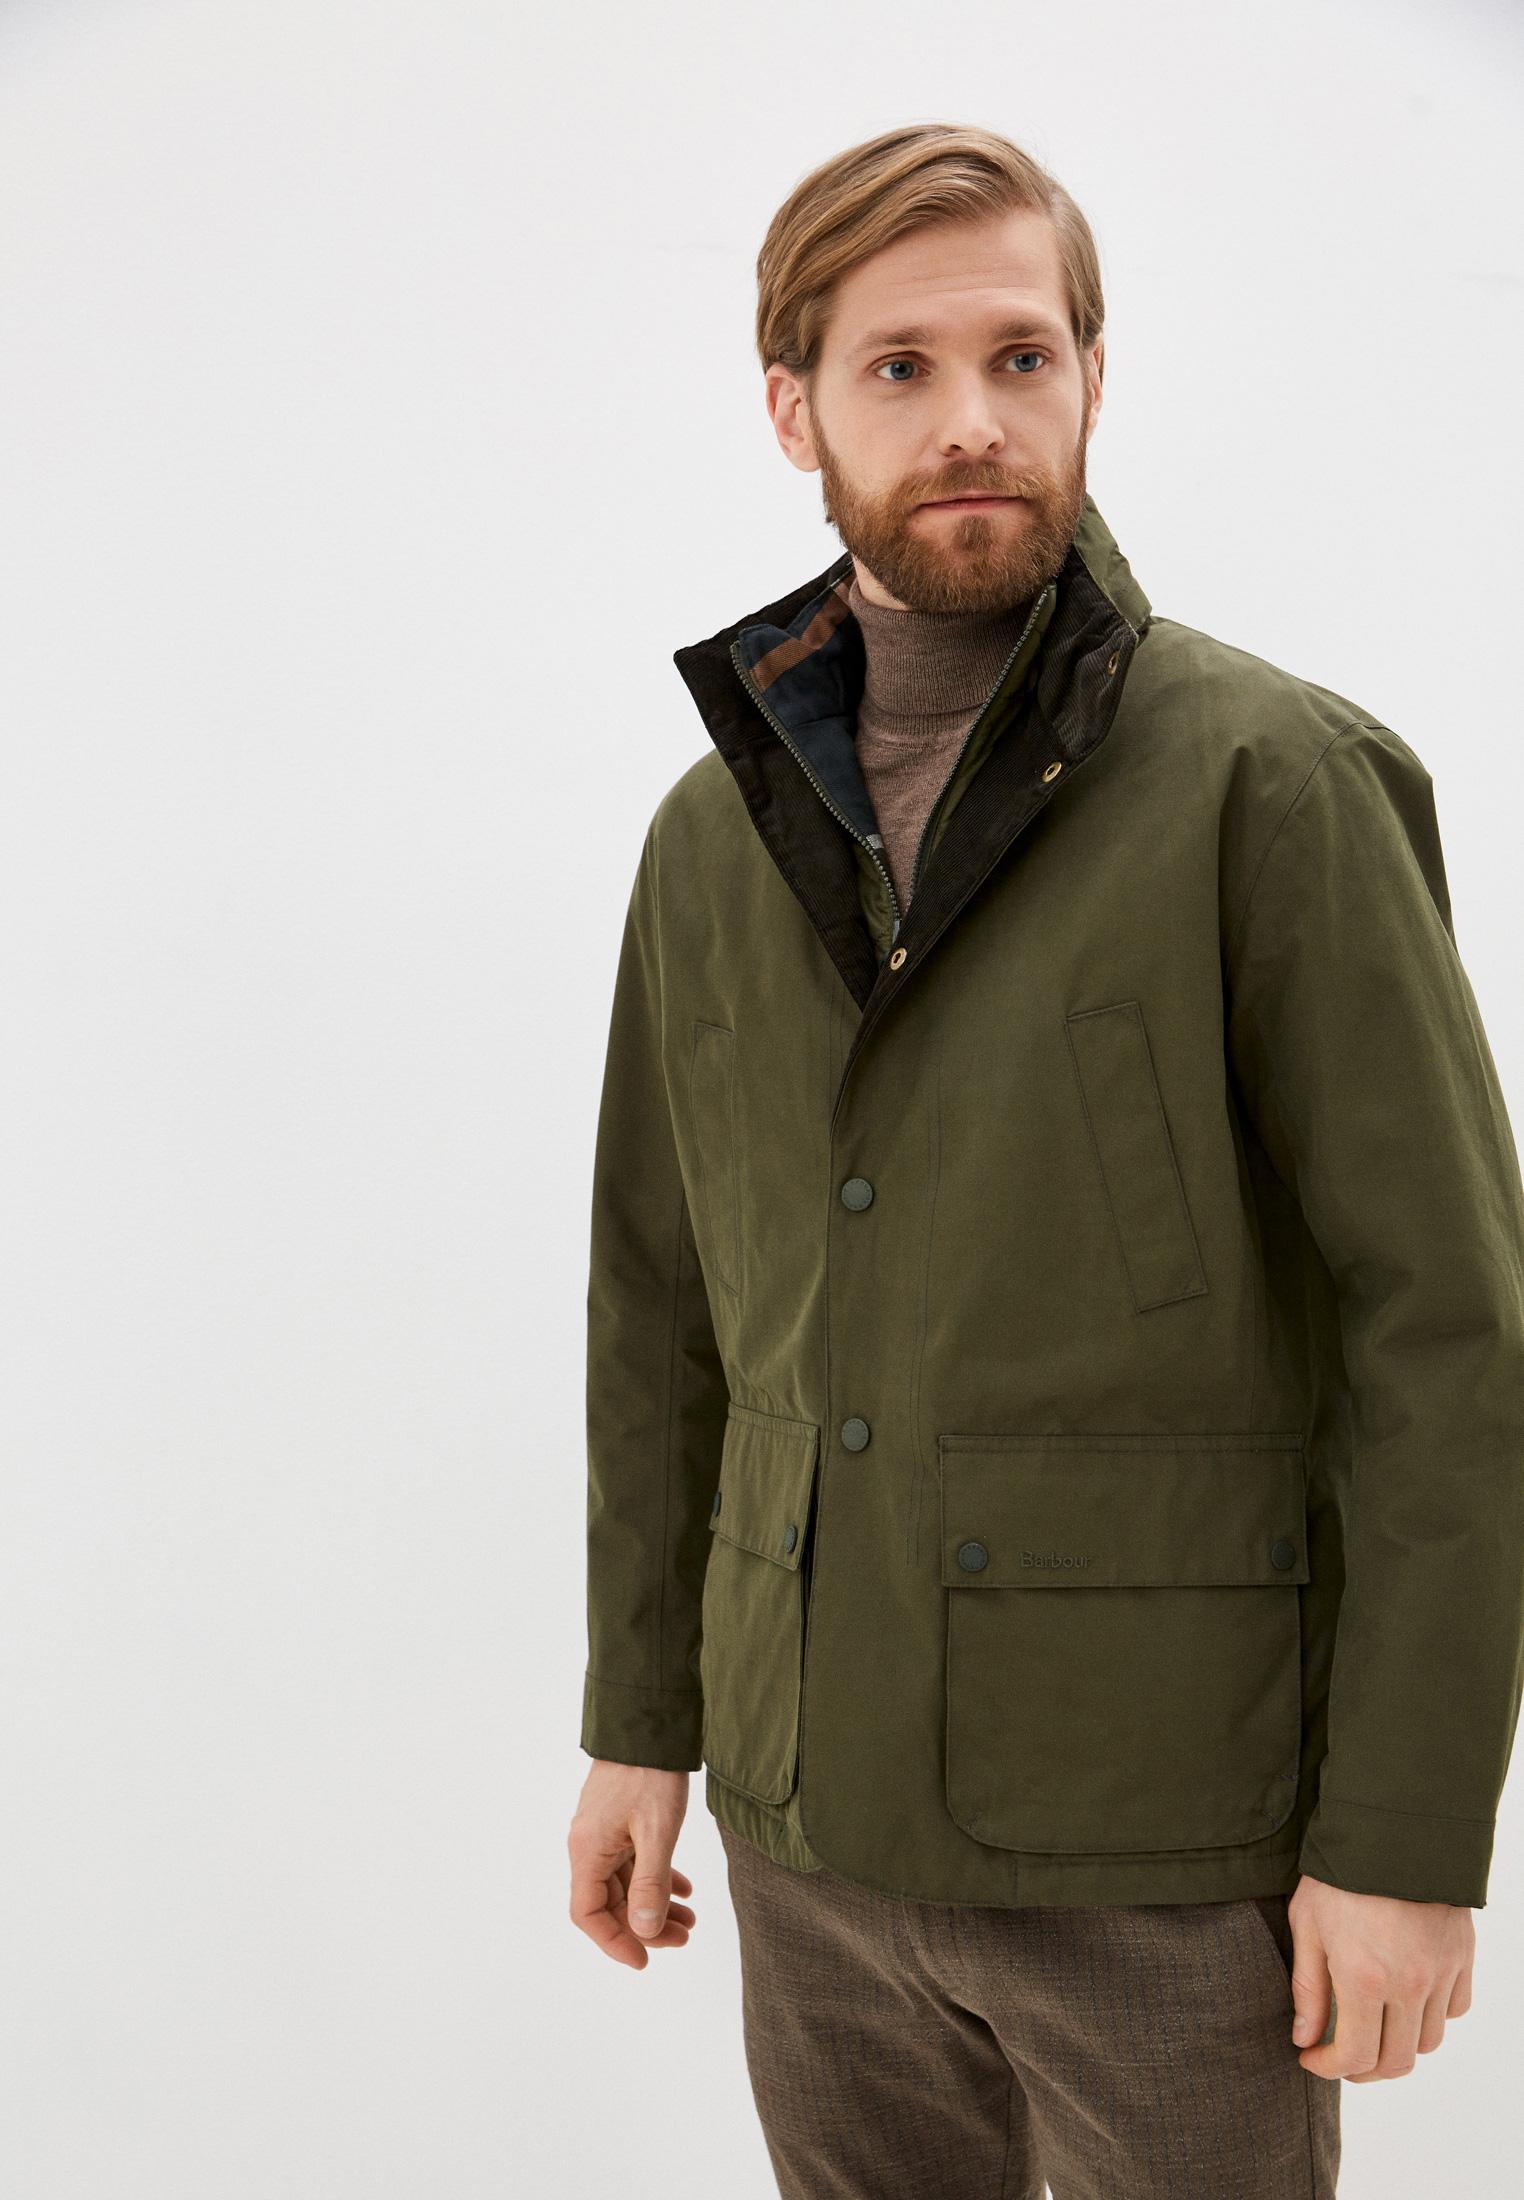 Утепленная куртка Barbour (Барбур) Куртка утепленная Barbour